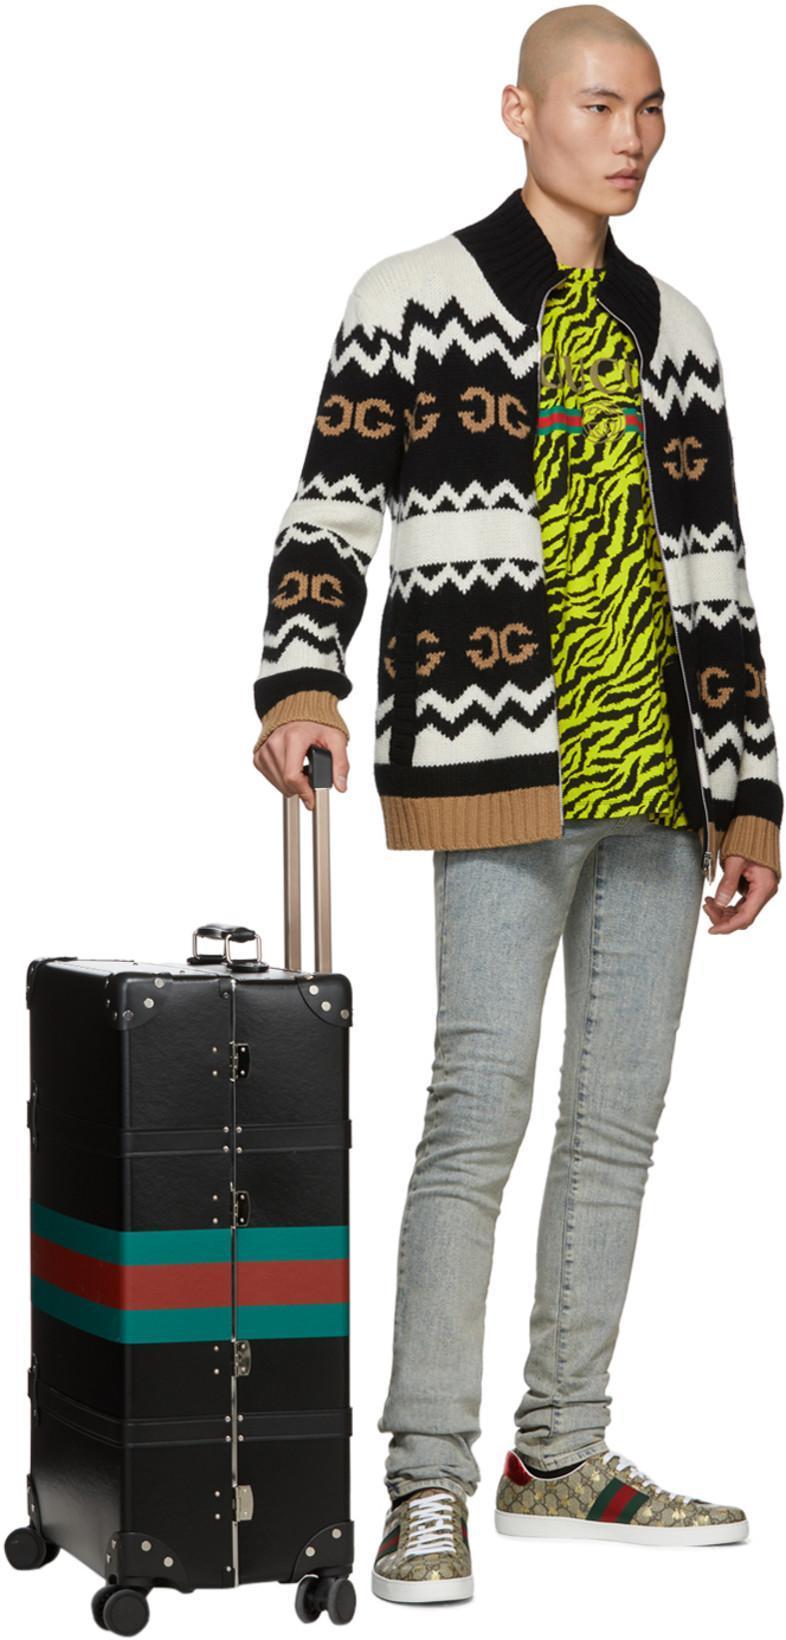 40b1f1a2e GUCCI Black Globe-Trotter Edition Web Carry-On Suitcase in Black Multi